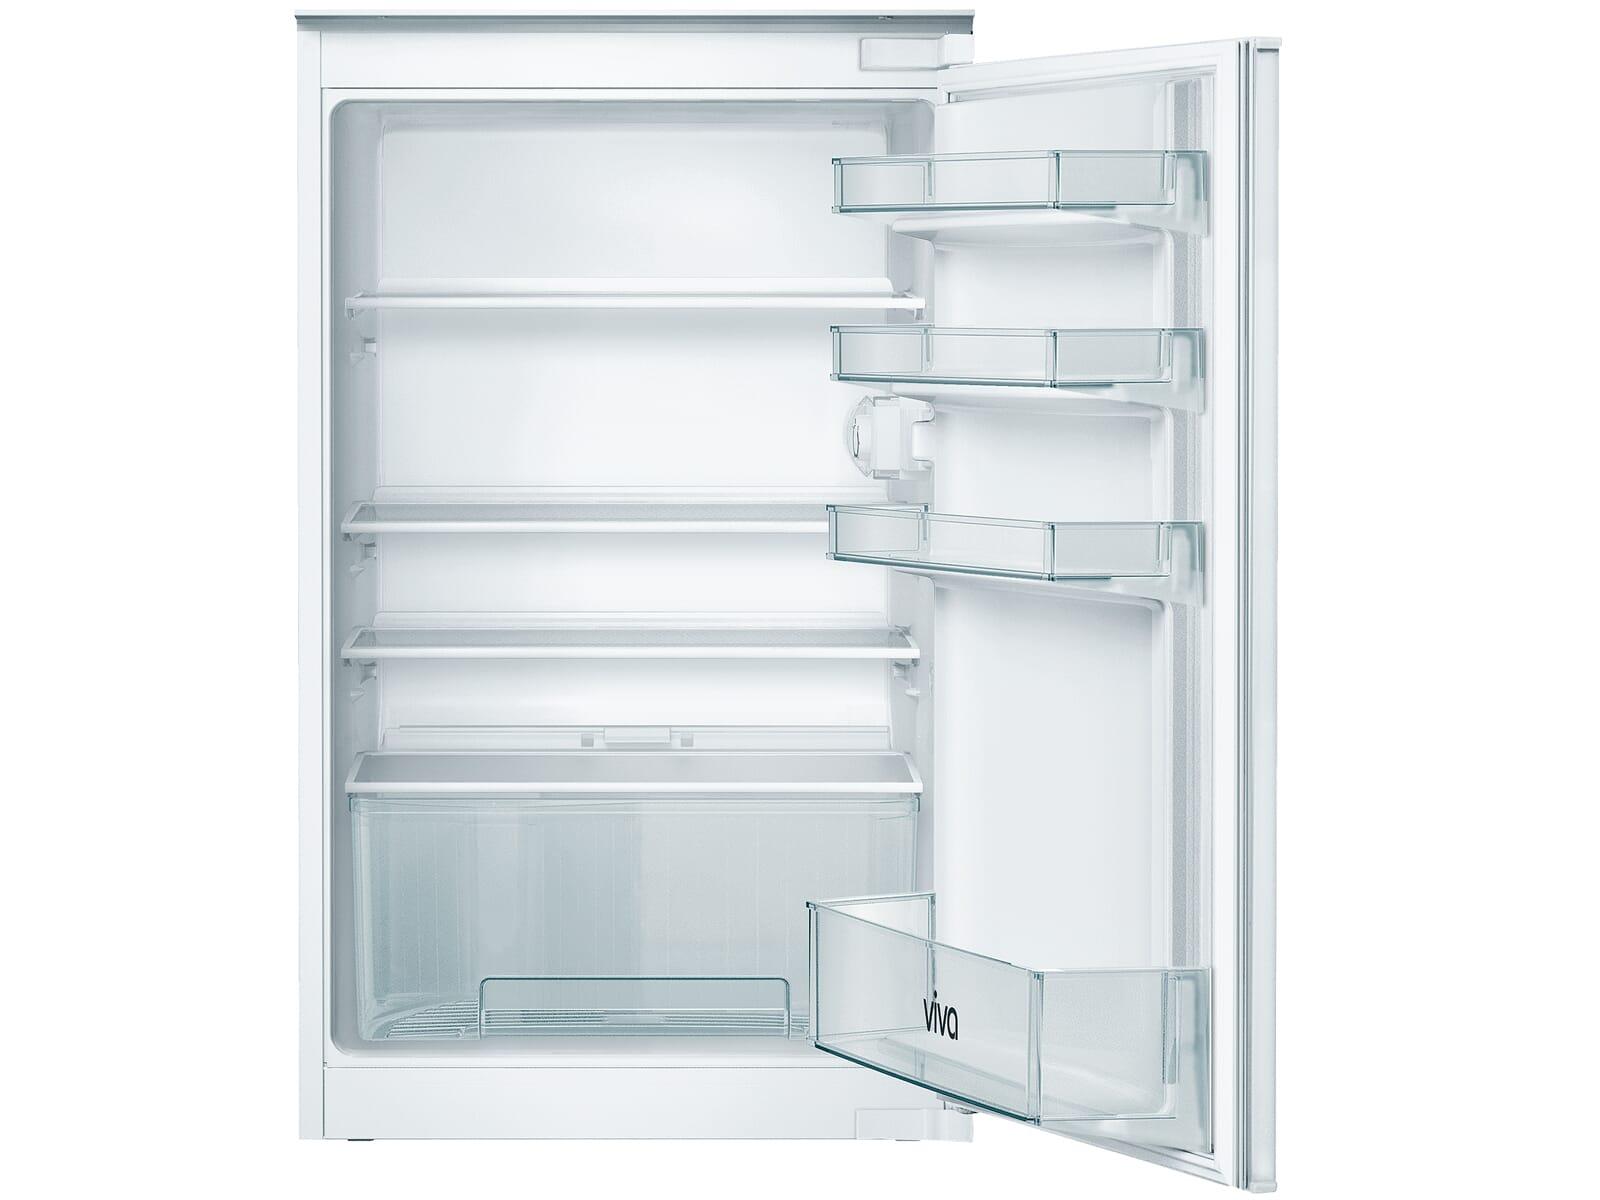 Bosch Kühlschrank Auffangbehälter Ausbauen : Siemens kühlschrank gemüsefach ausbauen viva vvir